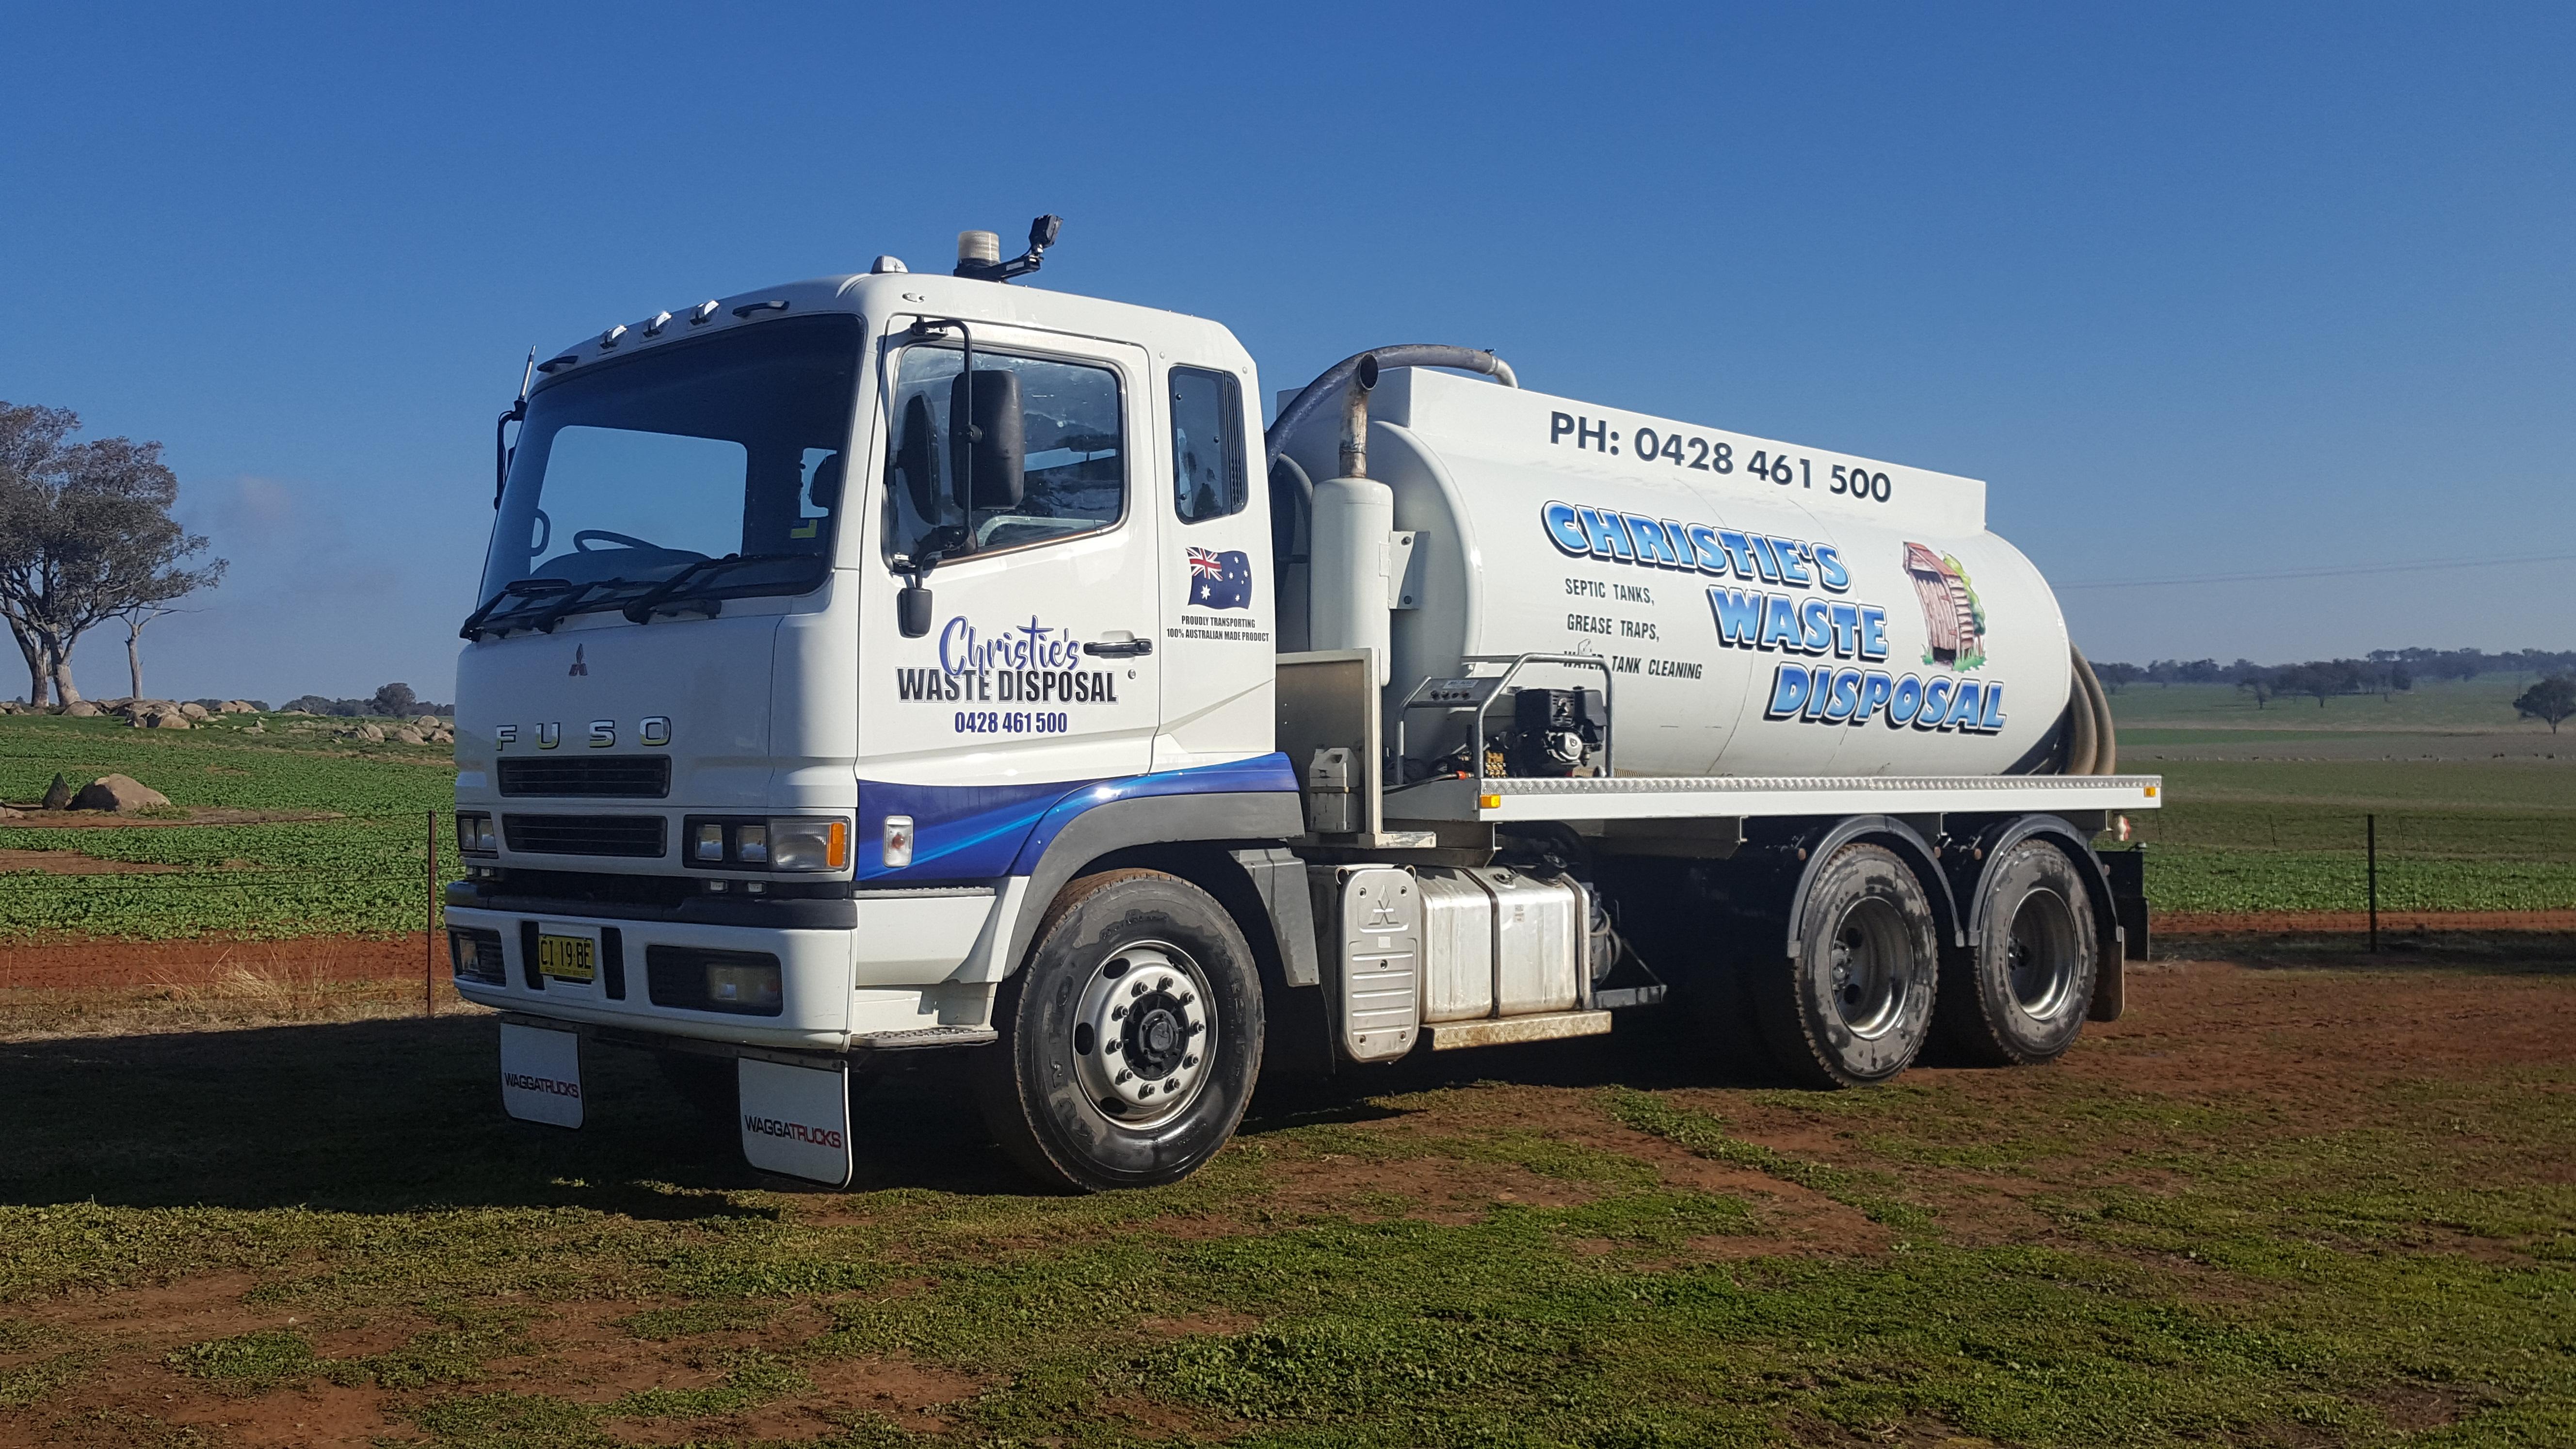 Christie's Waste Disposal - Ulladulla, NSW 2539 - 0428 461 500   ShowMeLocal.com